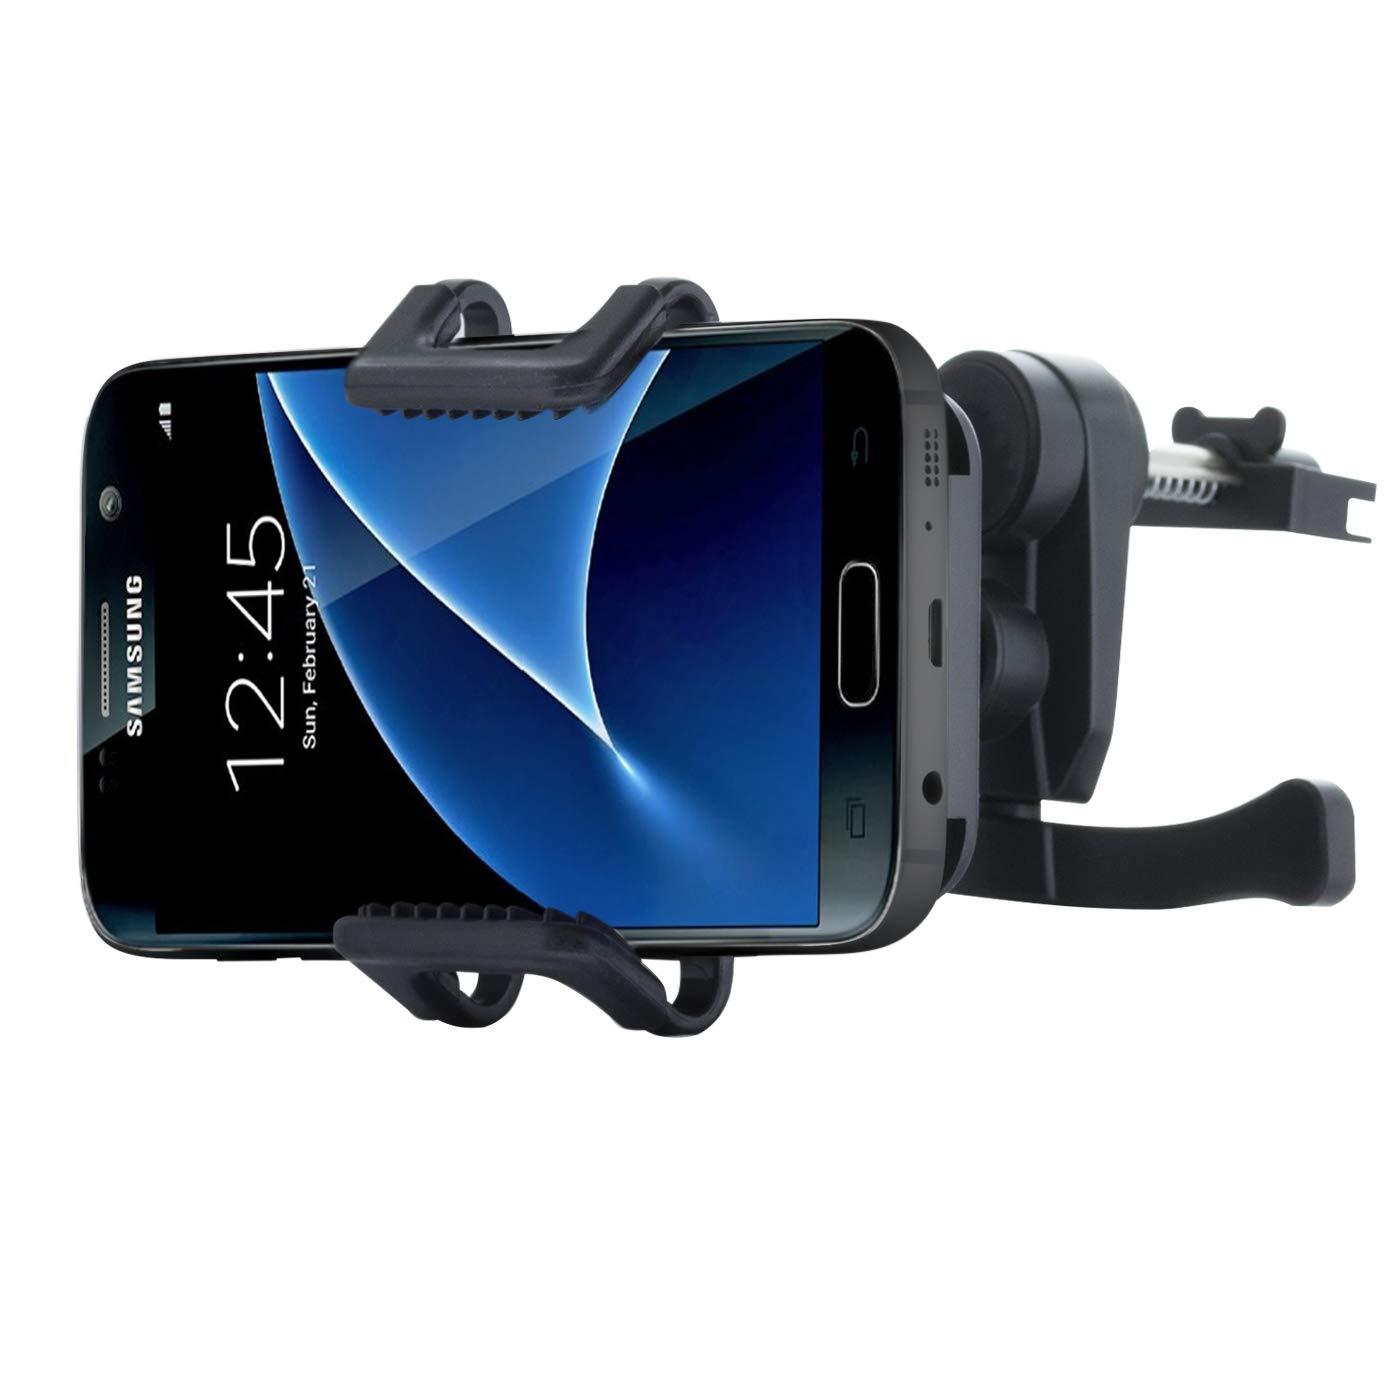 Ladeger/ät Micro USB Ladekabel KFZ Adapter f/ür Samsung Galaxy S7 S6 Edge S5 Neo S4 S3 Mini A3 A5 A7 J1 J3 J5 J7 Note 1 2 3 4 5 NessKa/® Premium Auto Handy L/üftung Halter Halterung mit Ladefunktion